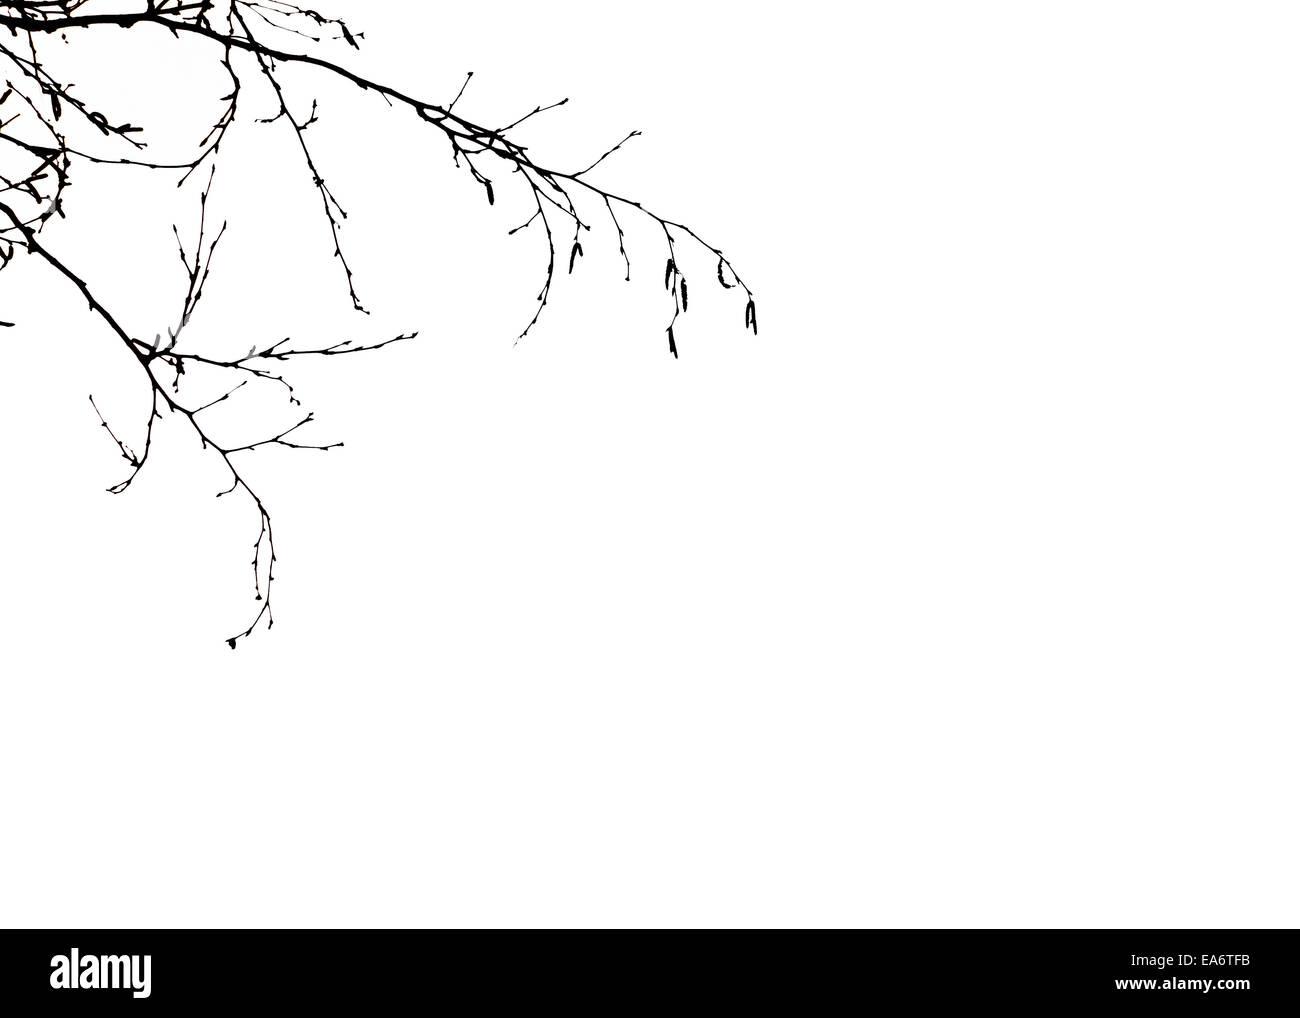 La silhouette des branches d'arbre. Photo Stock